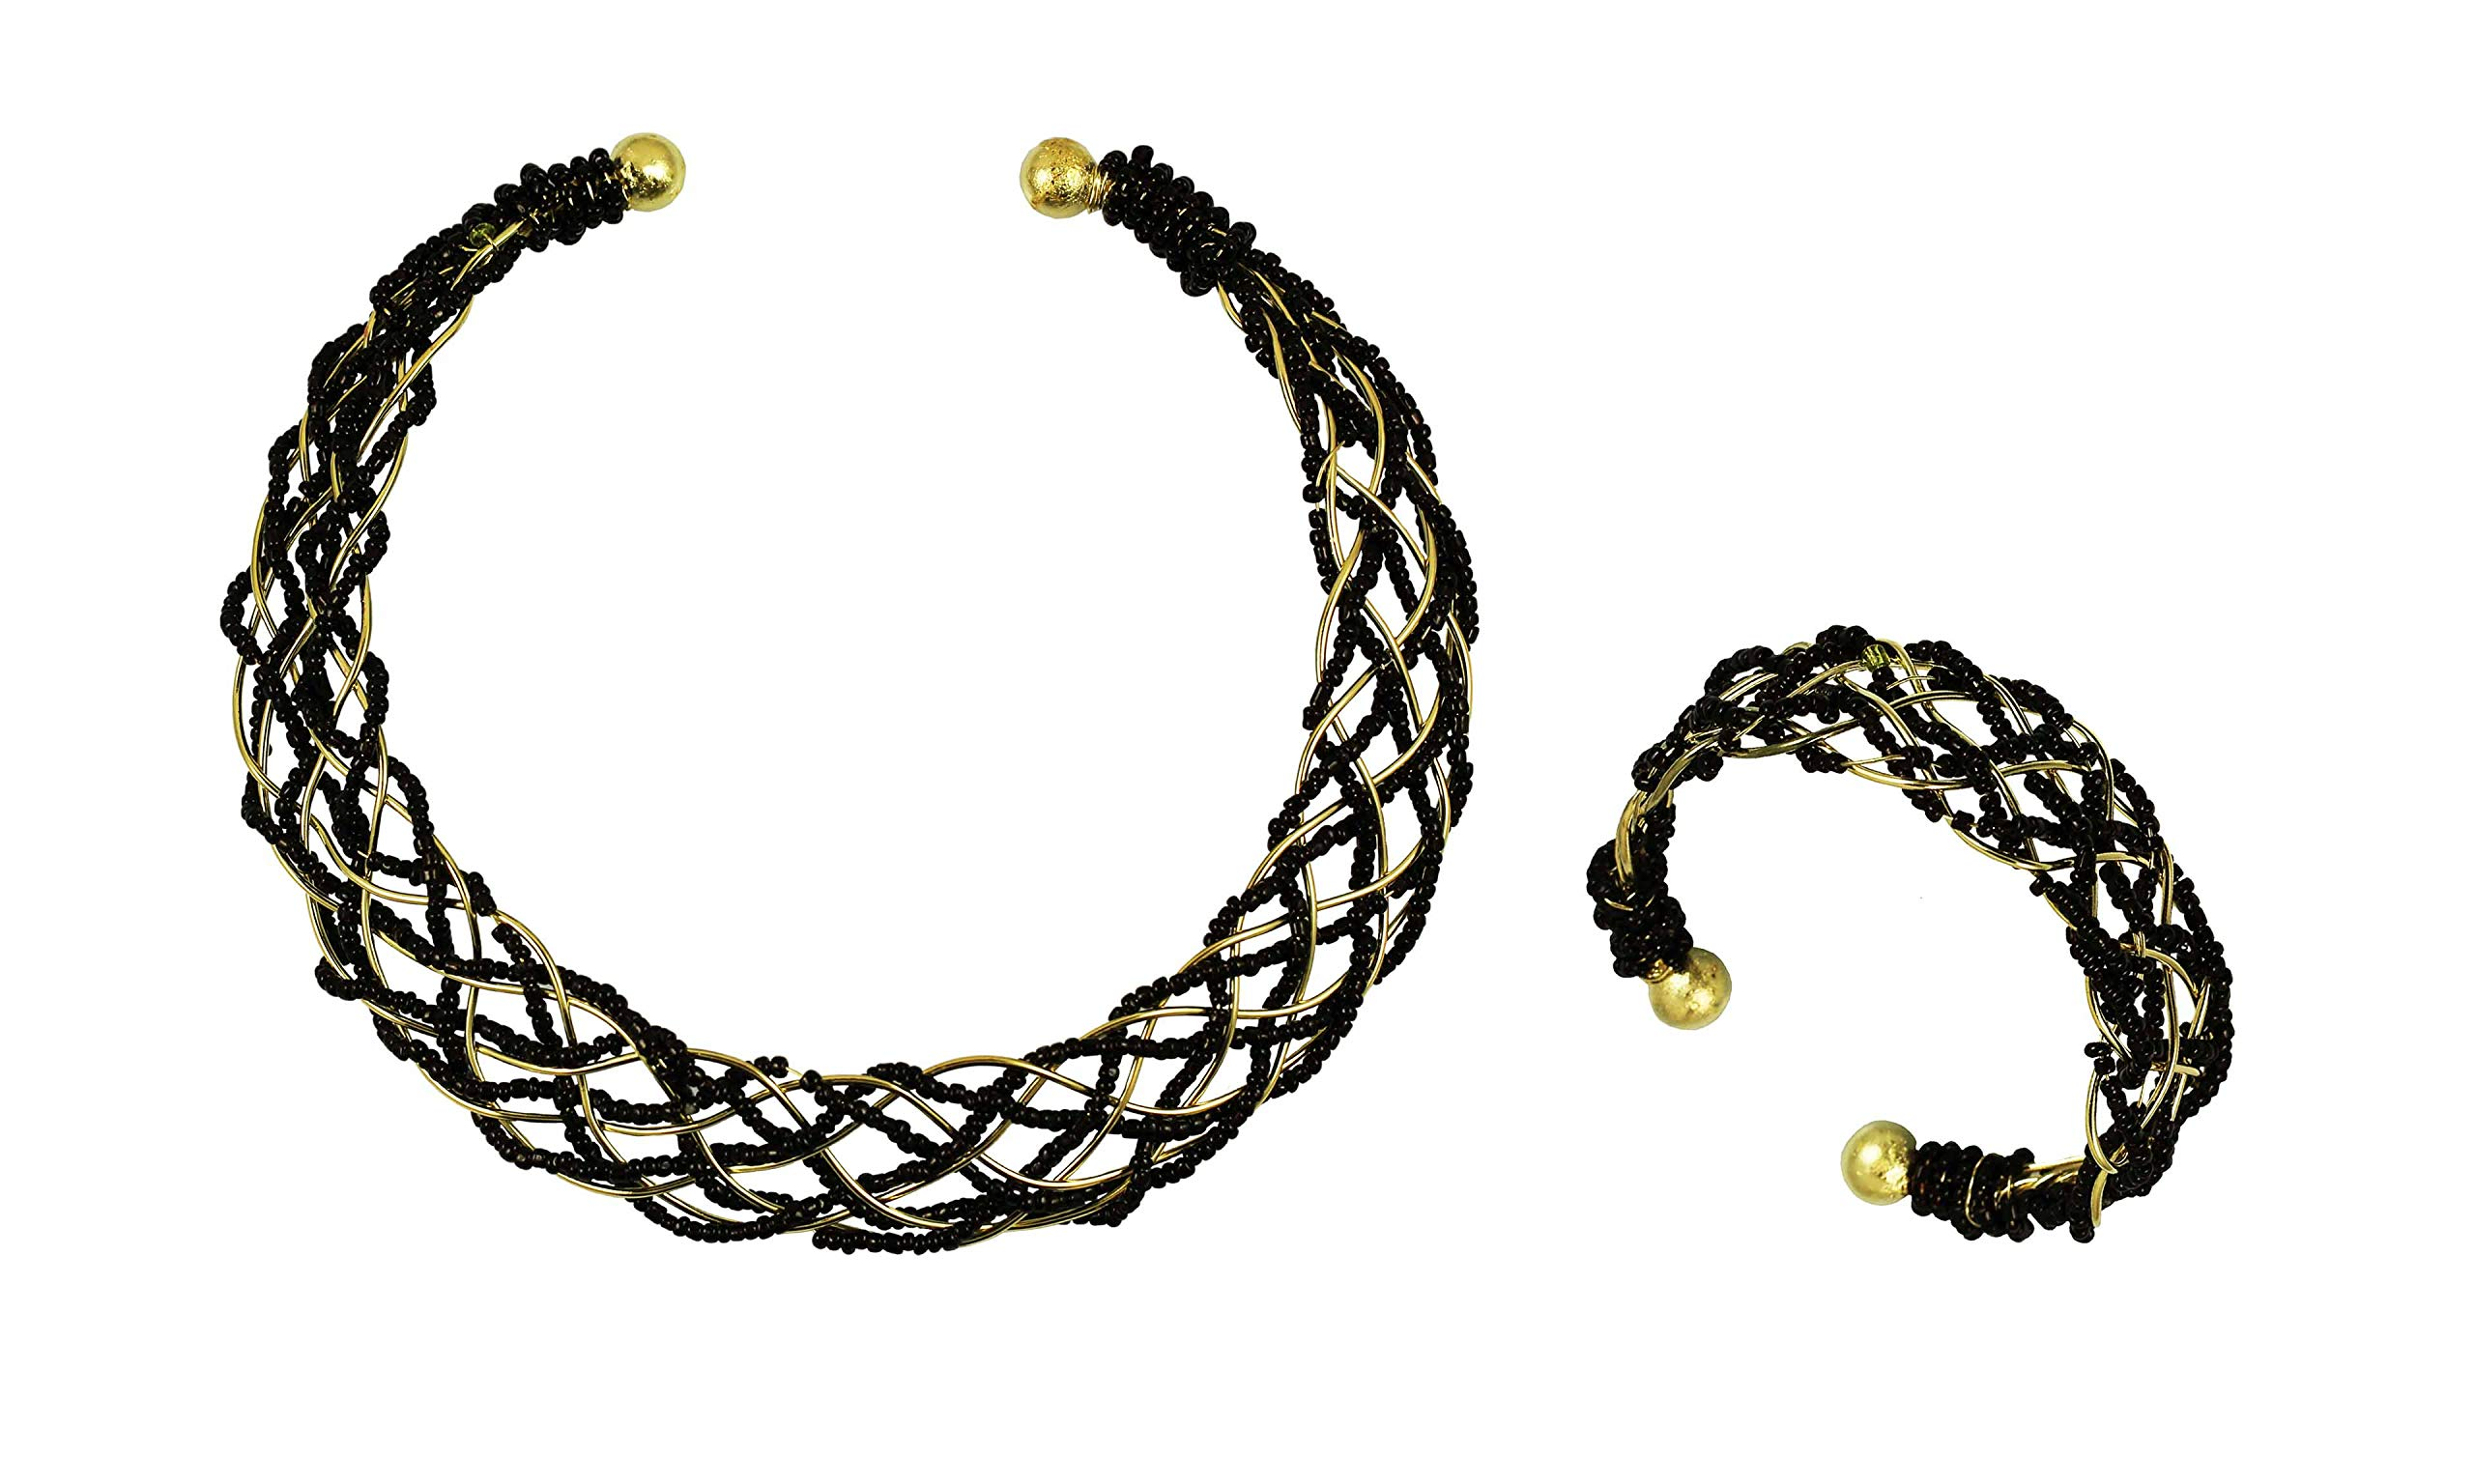 Touchstone Indian Bollywood Elegant Choker Torque Hasli Necklace Designer Jewelry for Women